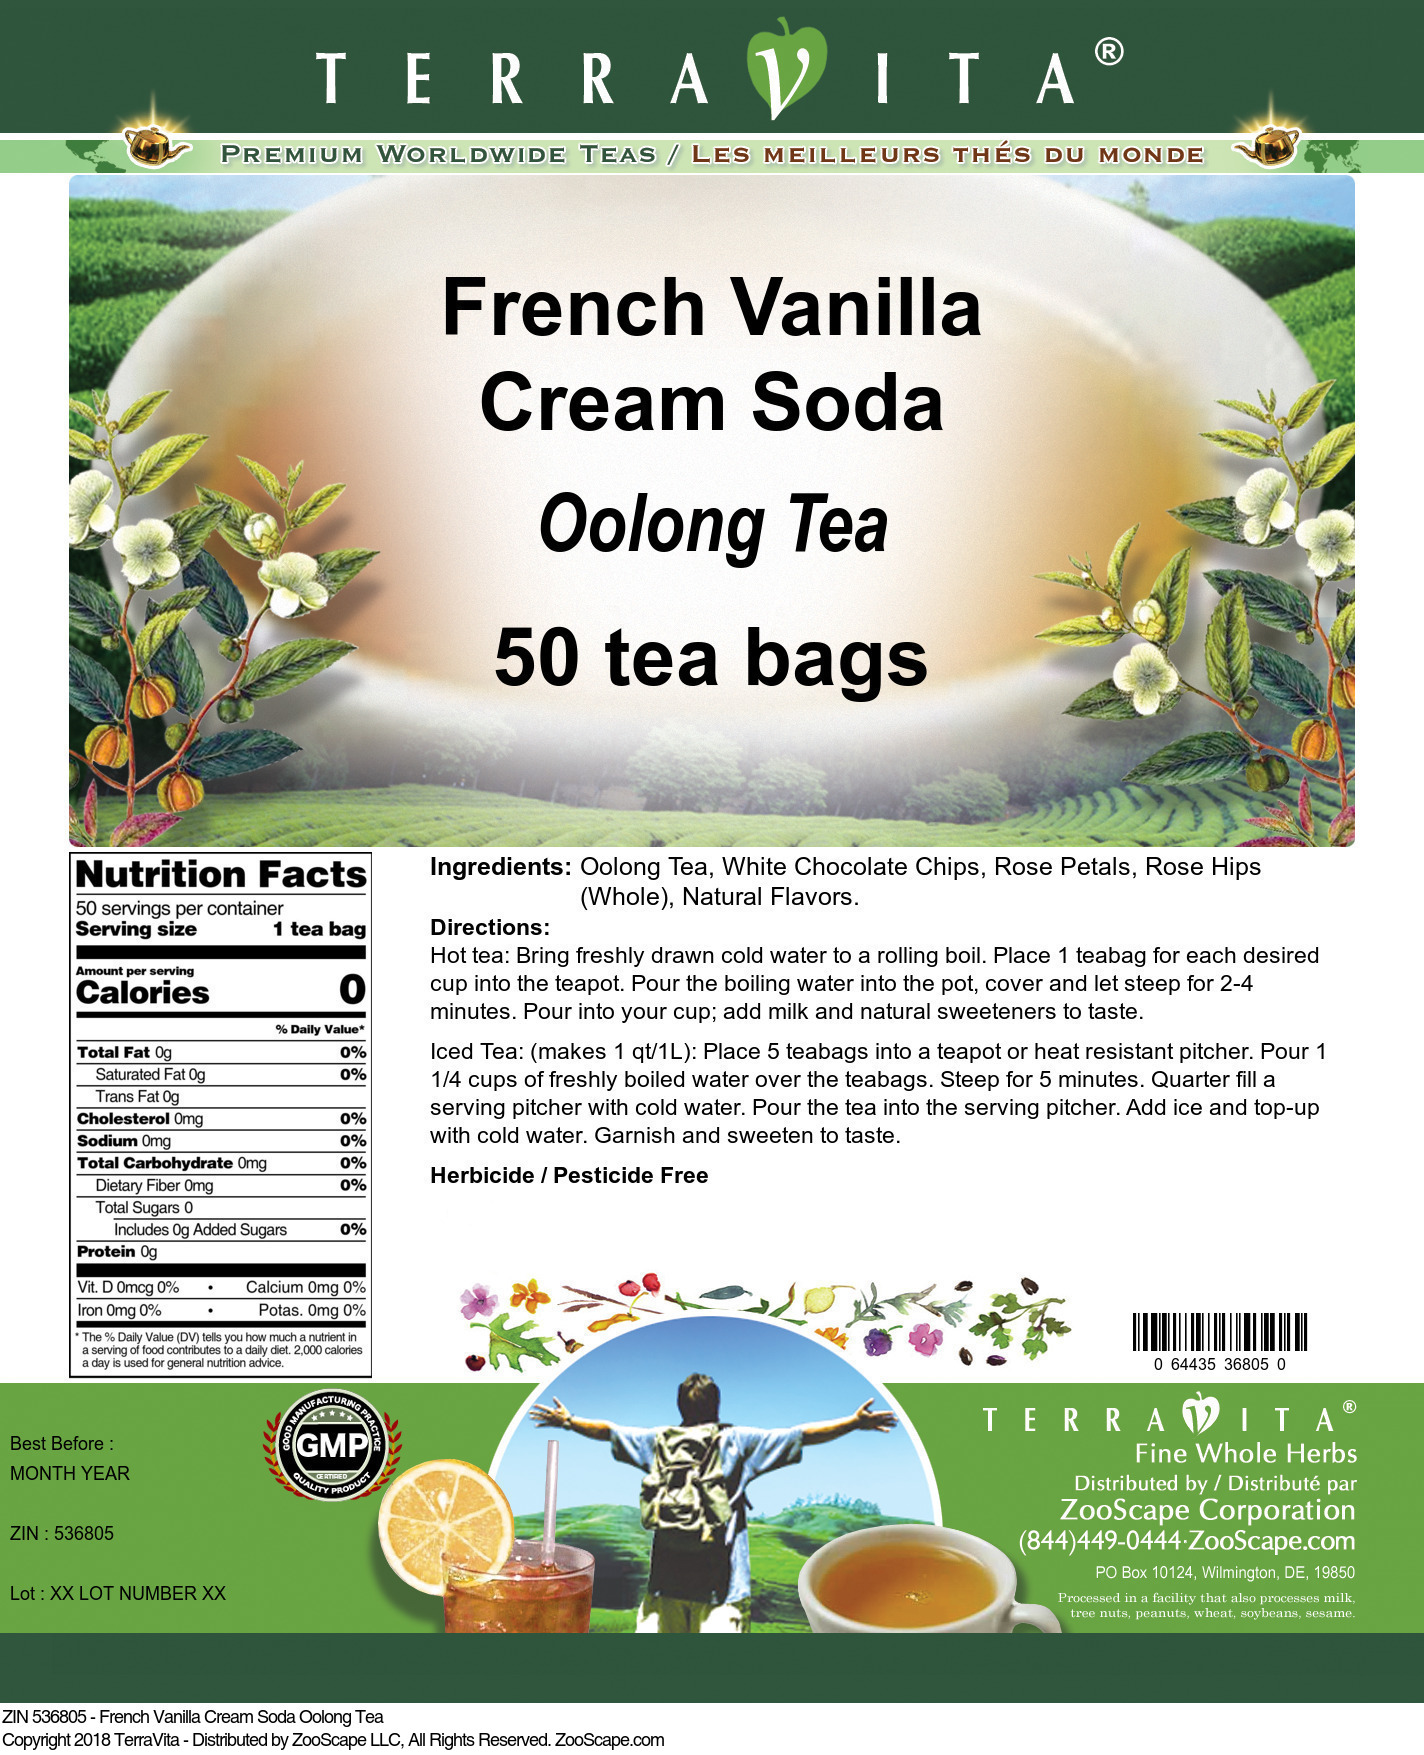 French Vanilla Cream Soda Oolong Tea